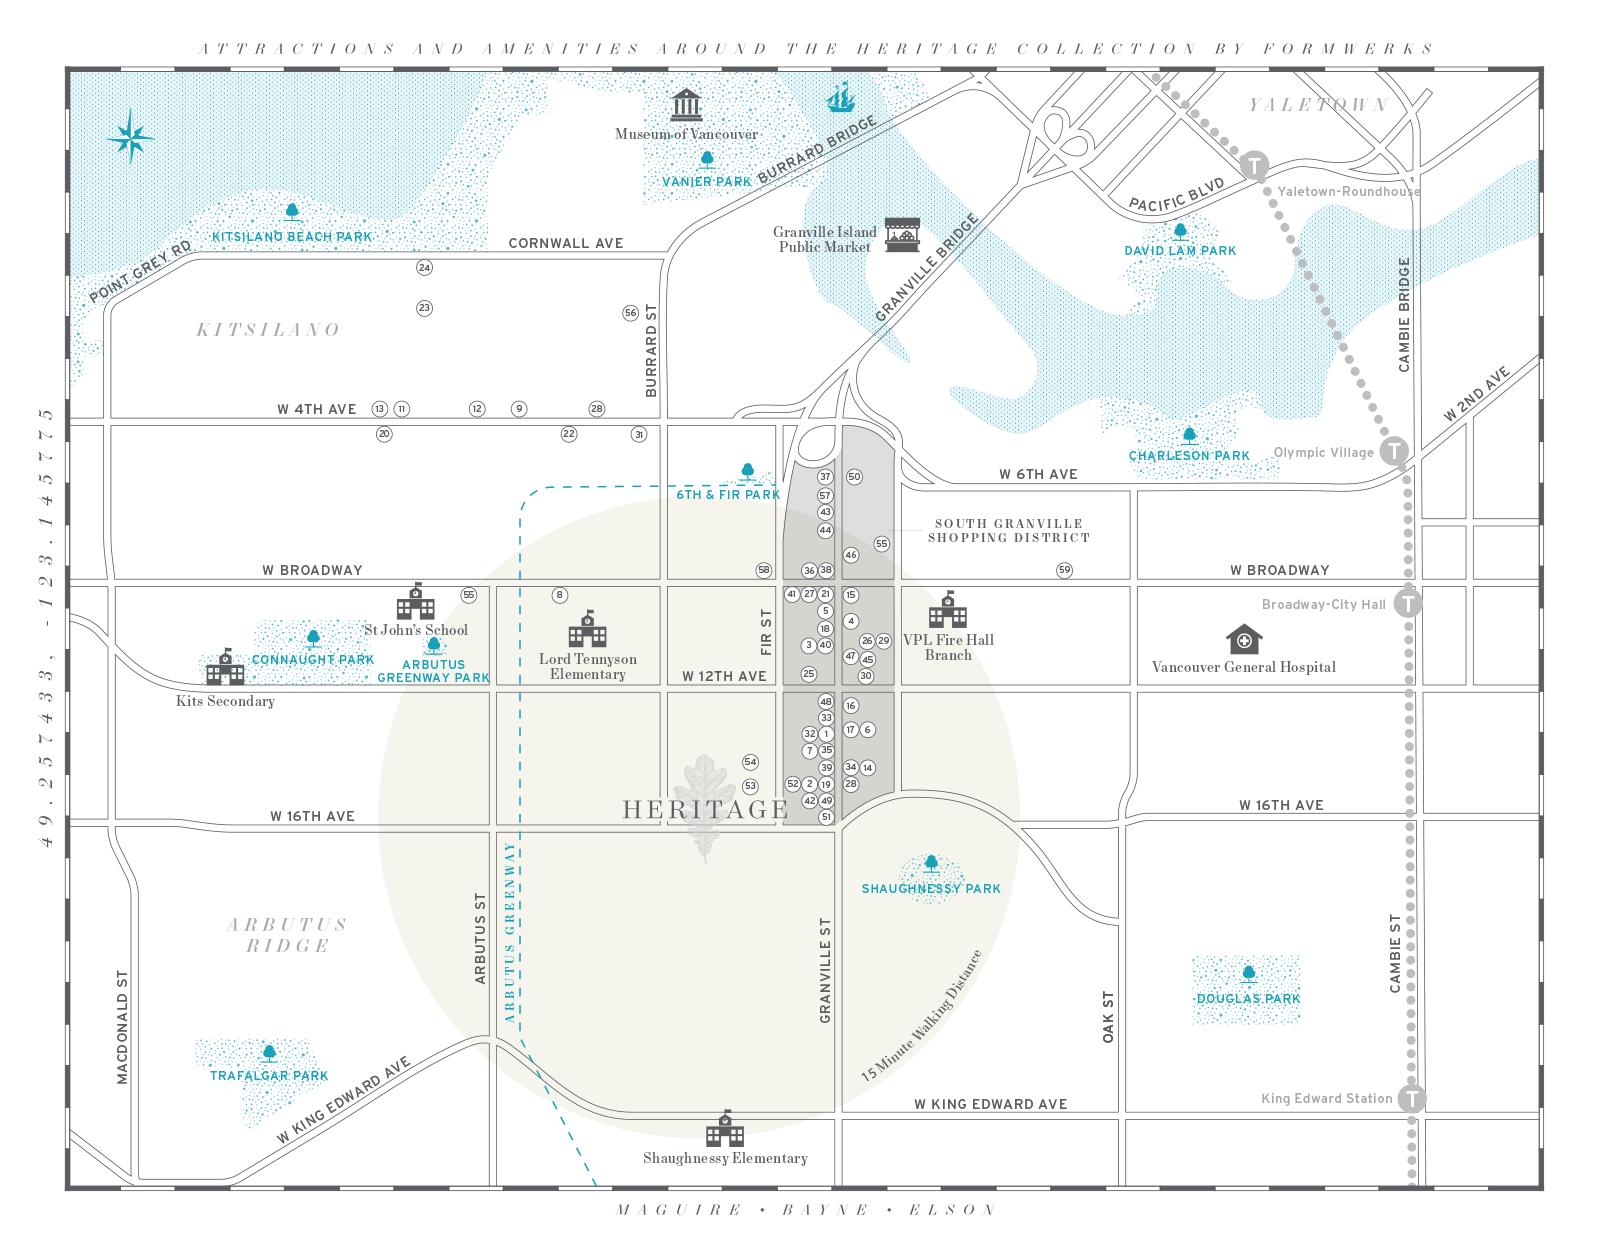 Heritage Location/Amenities Map